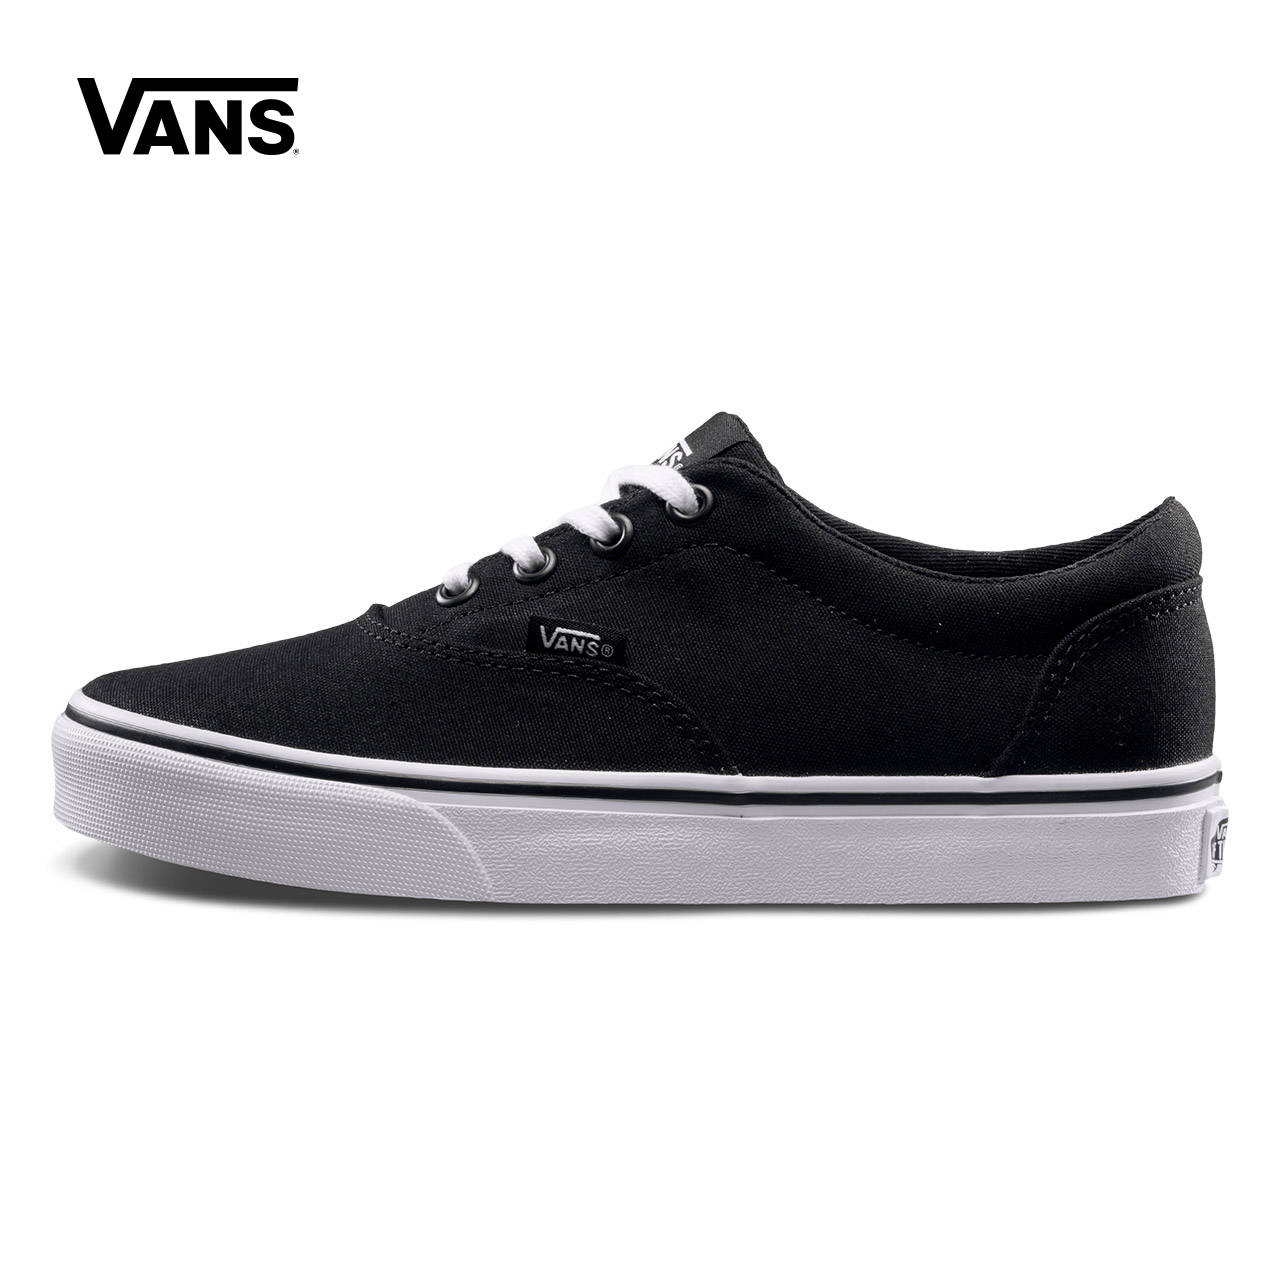 Vans 范斯官方秋季女款板鞋|VN0A3MVZ3SY-L5R